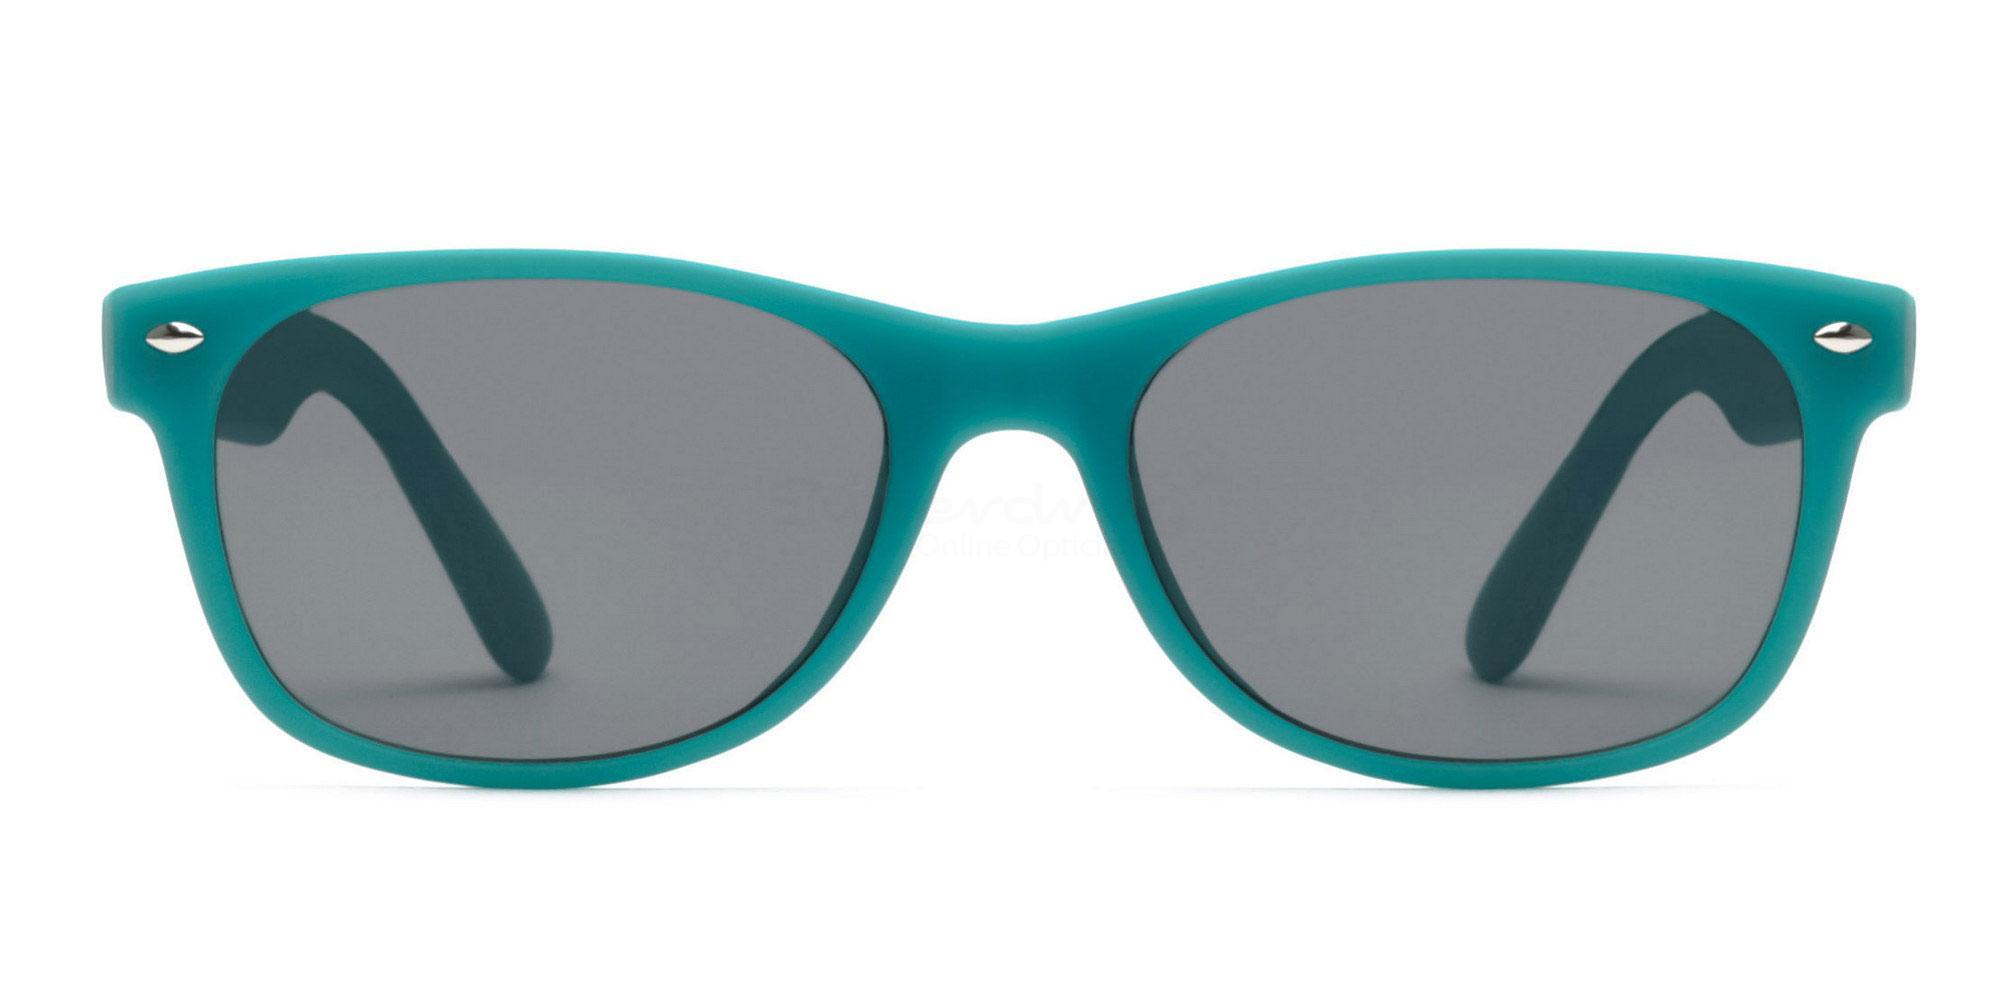 Green S8122 - Green (Sunglasses) Sunglasses, Helium